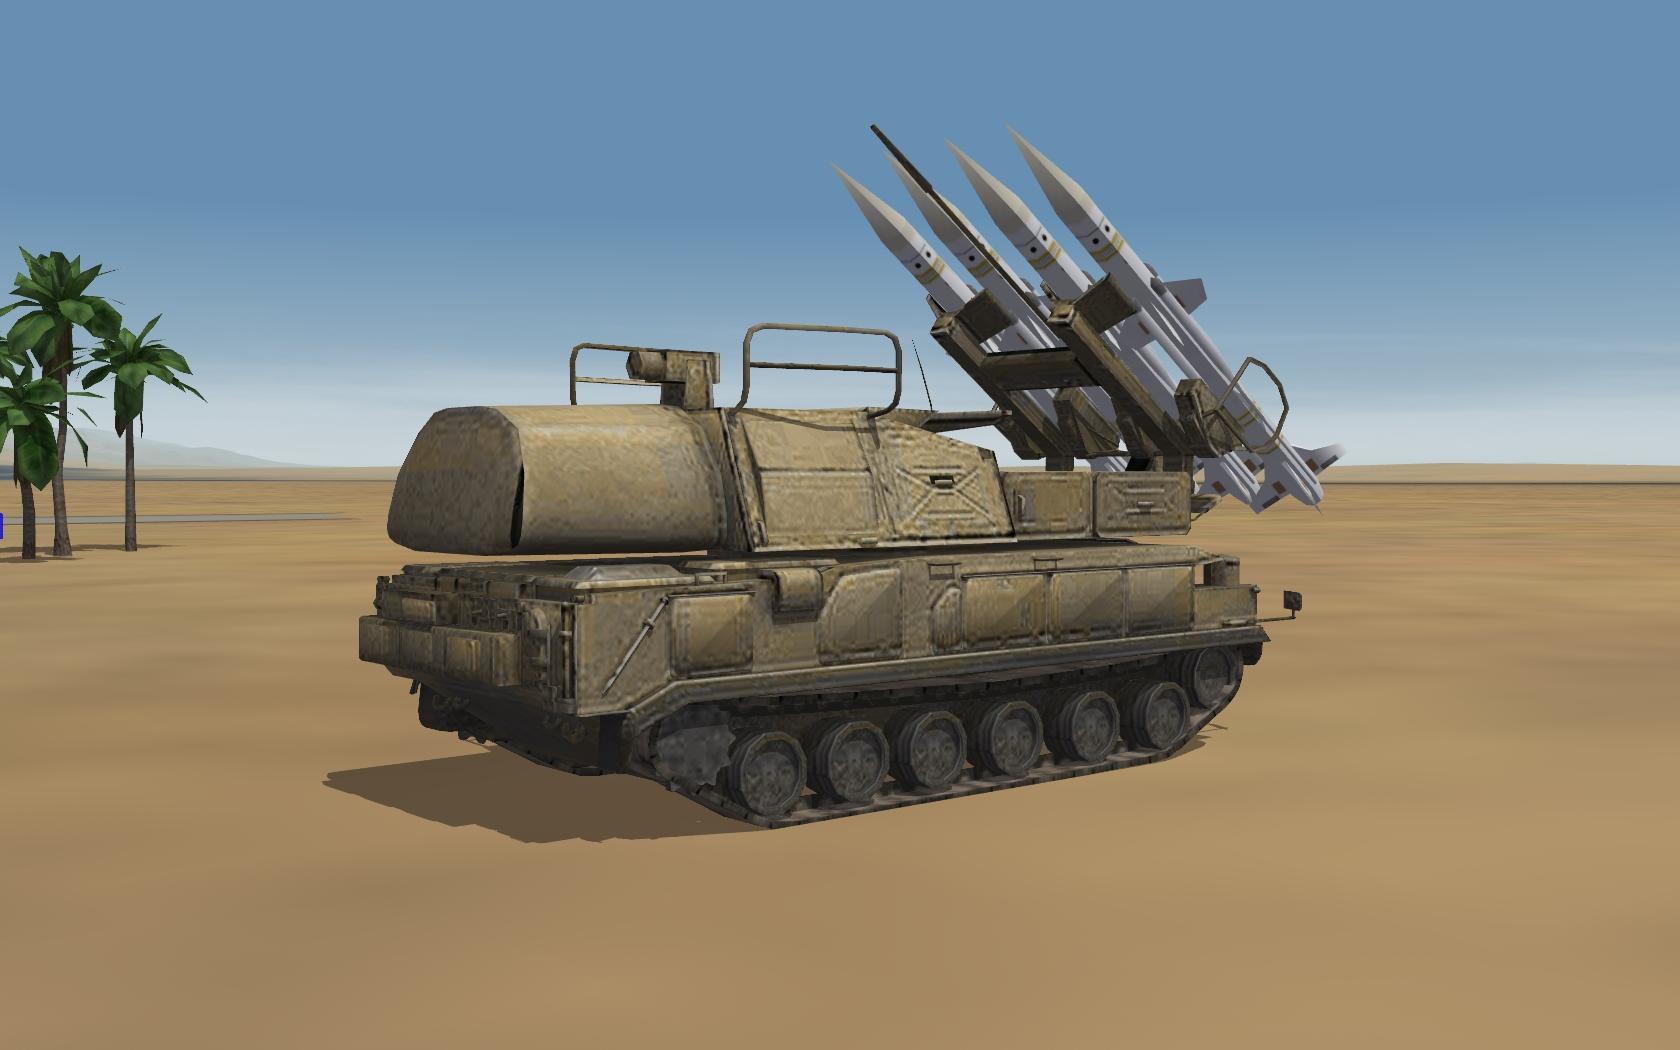 Russian 9K37-BUK Missile System